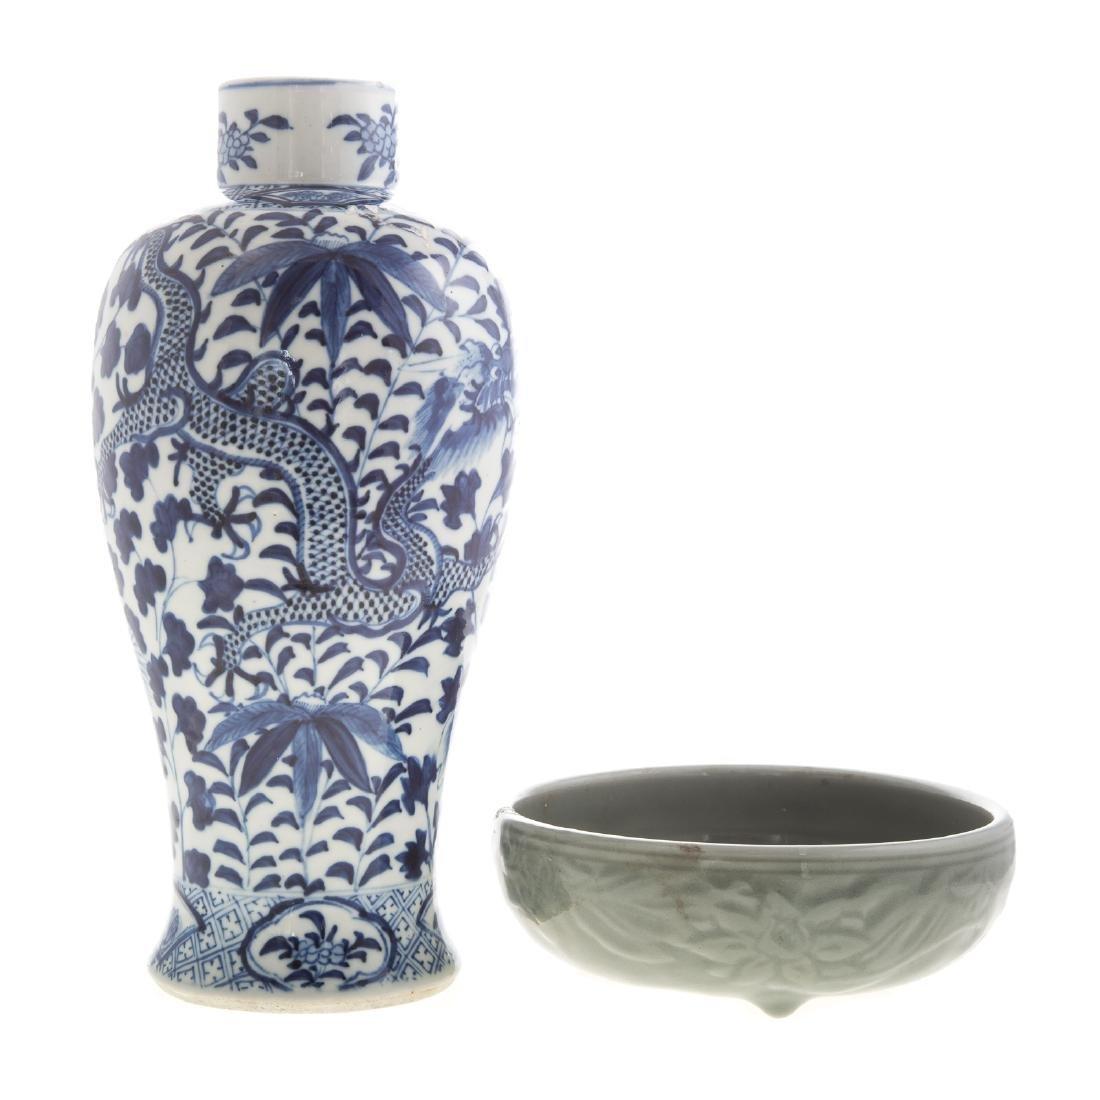 Chinese celadon bowl and blue/white jar